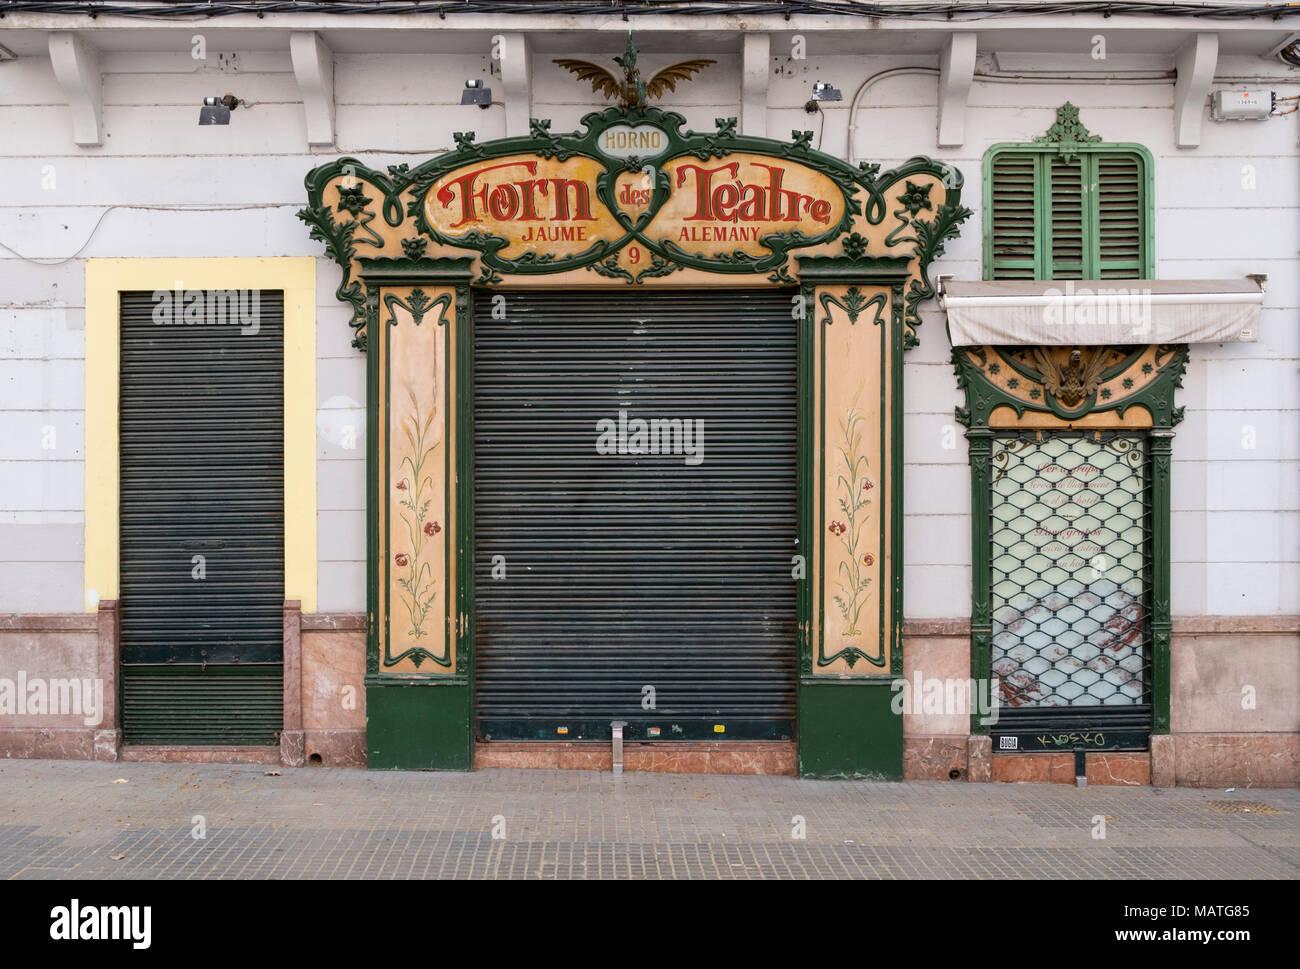 Mallorca, Palma de Mallorca, Placa Mercat, ehemalige Konditorei Forn dos Teatre, Fassade - Stock Image